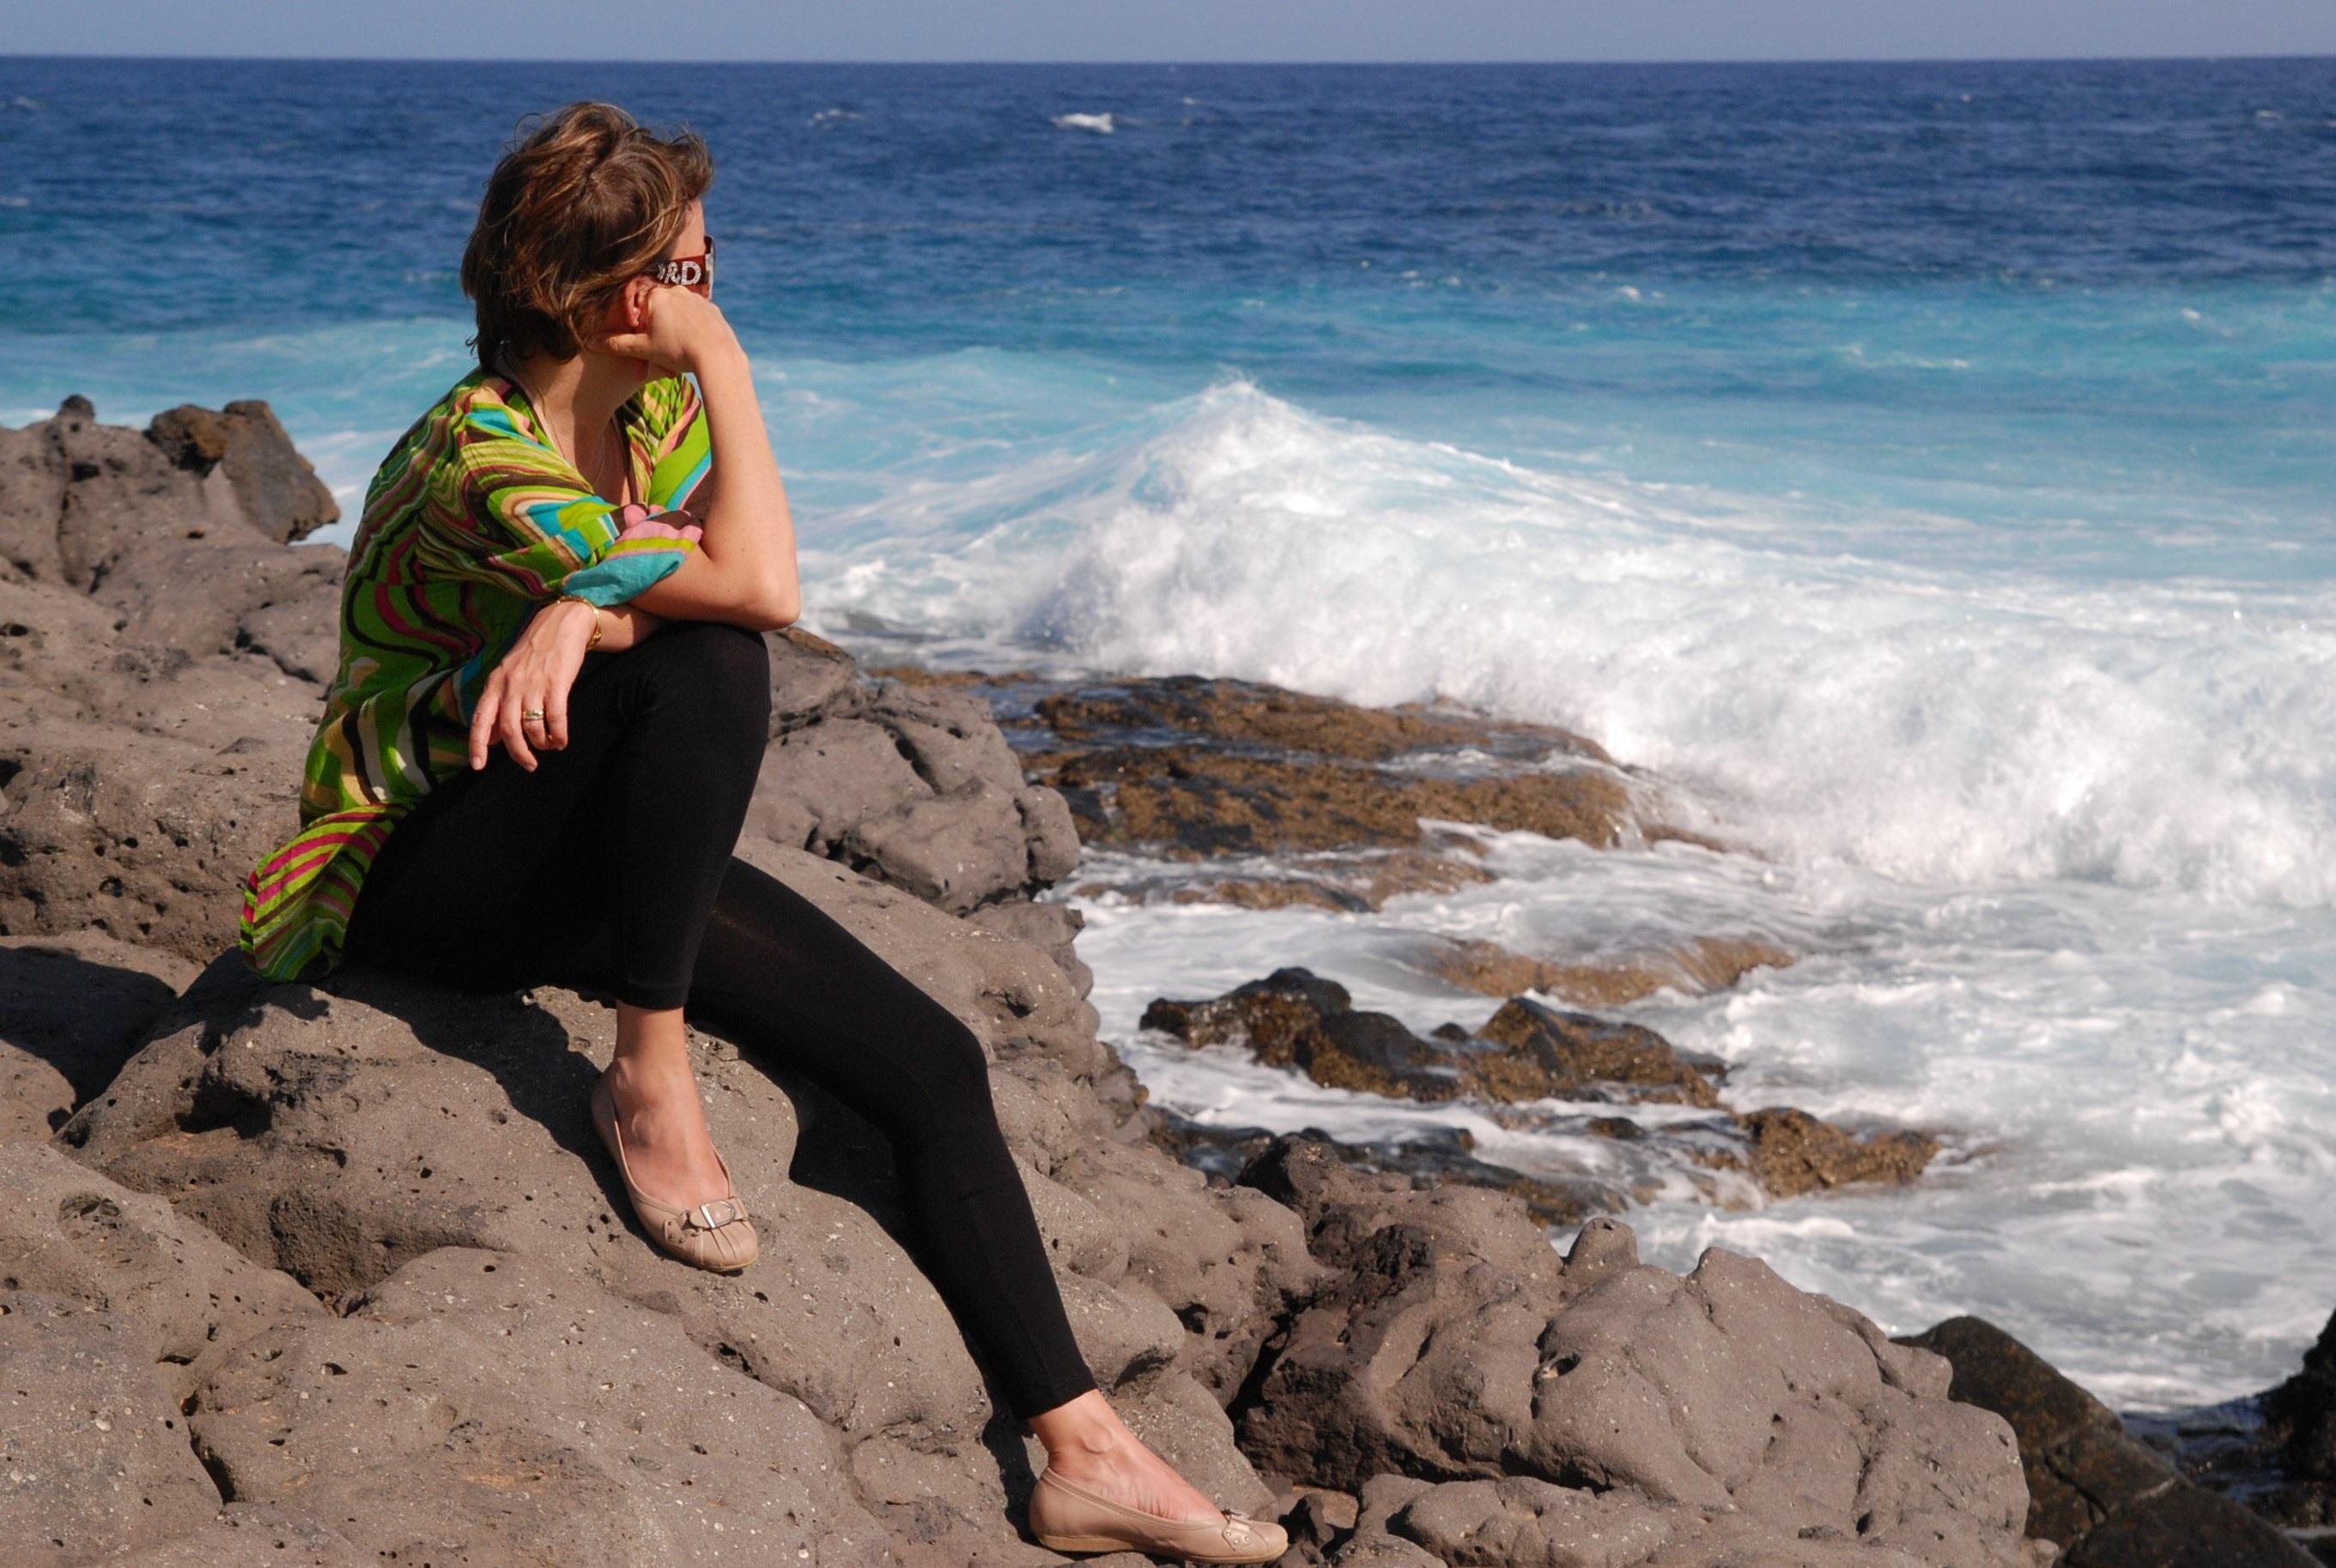 Pictures Brazil Mature Women Stock Photos